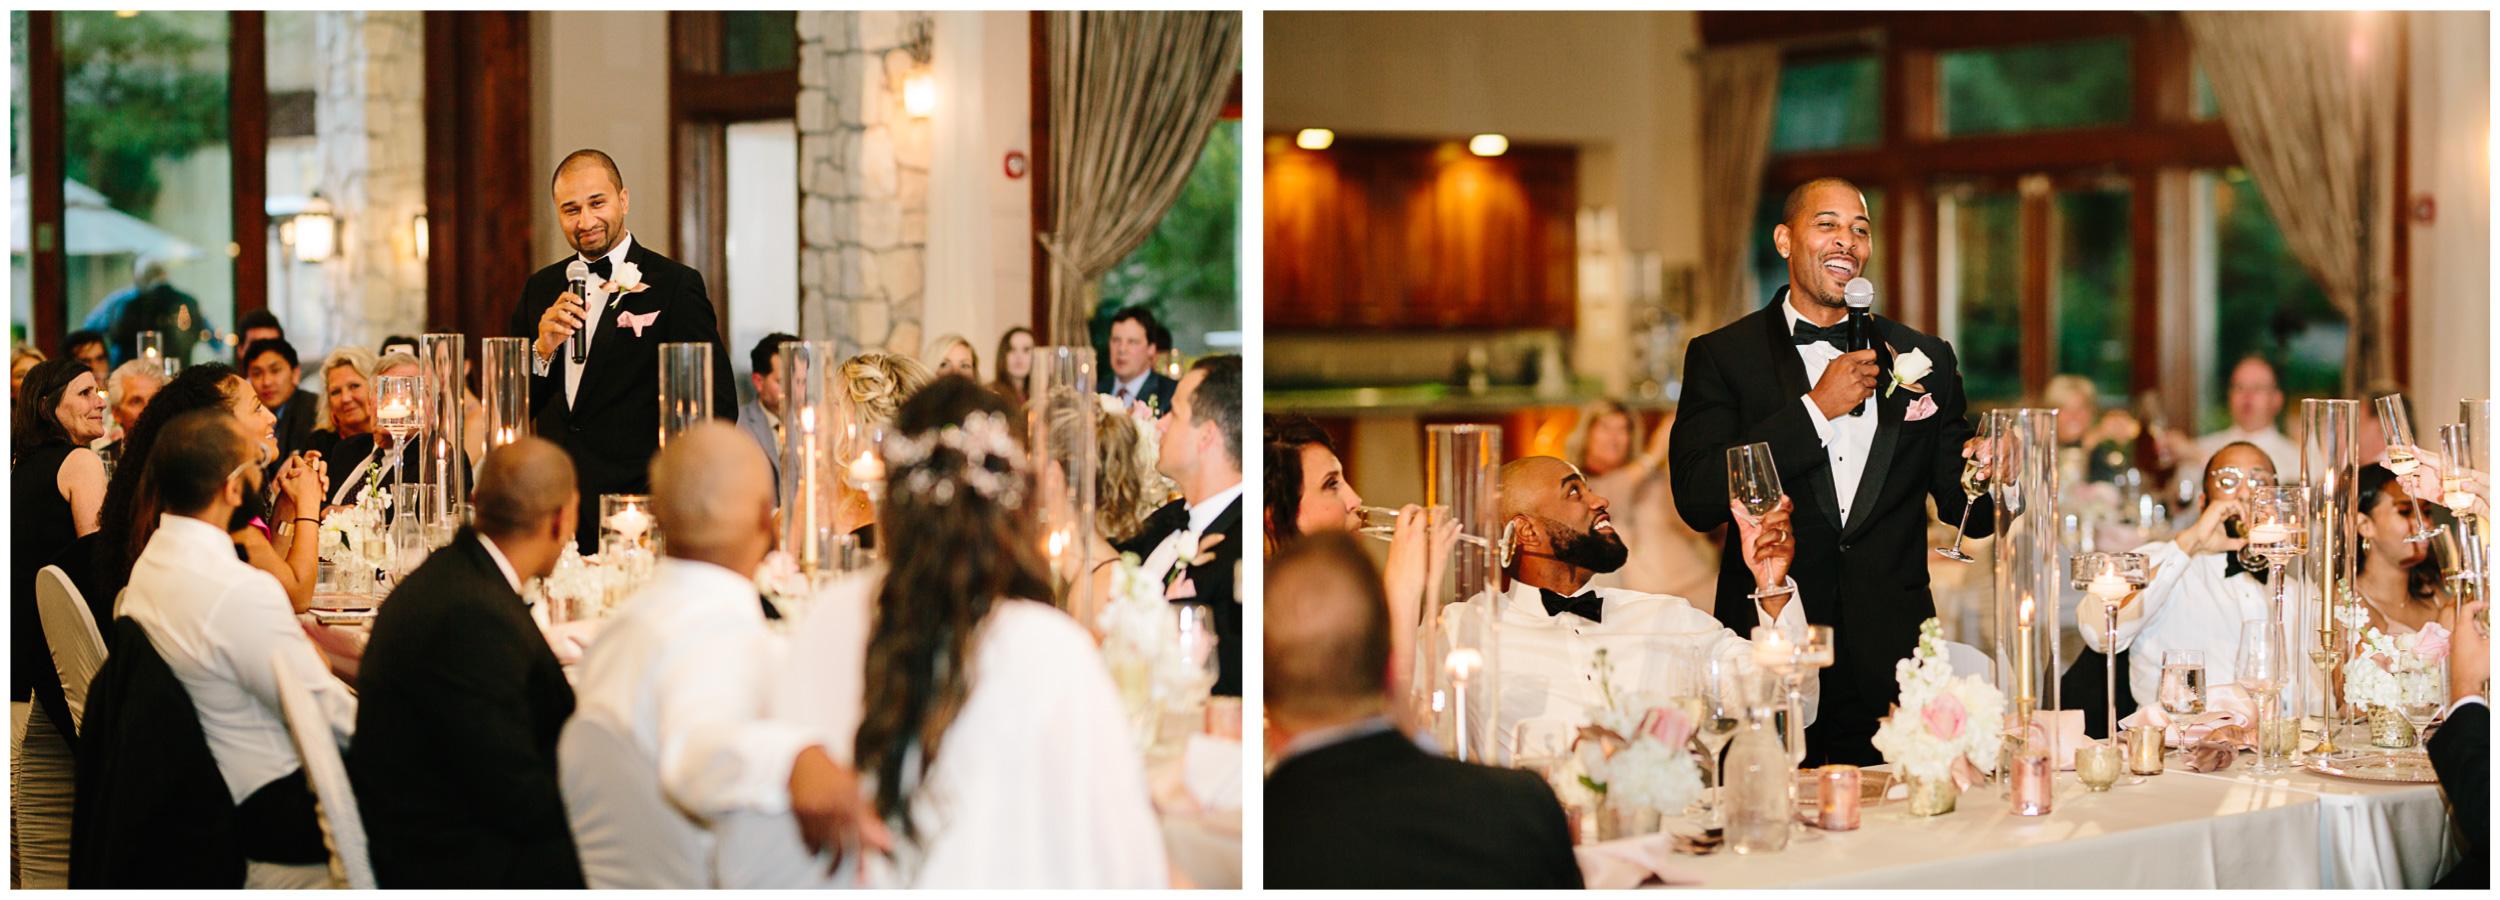 Cielo_At_Castle_Pines_Wedding_74.jpg